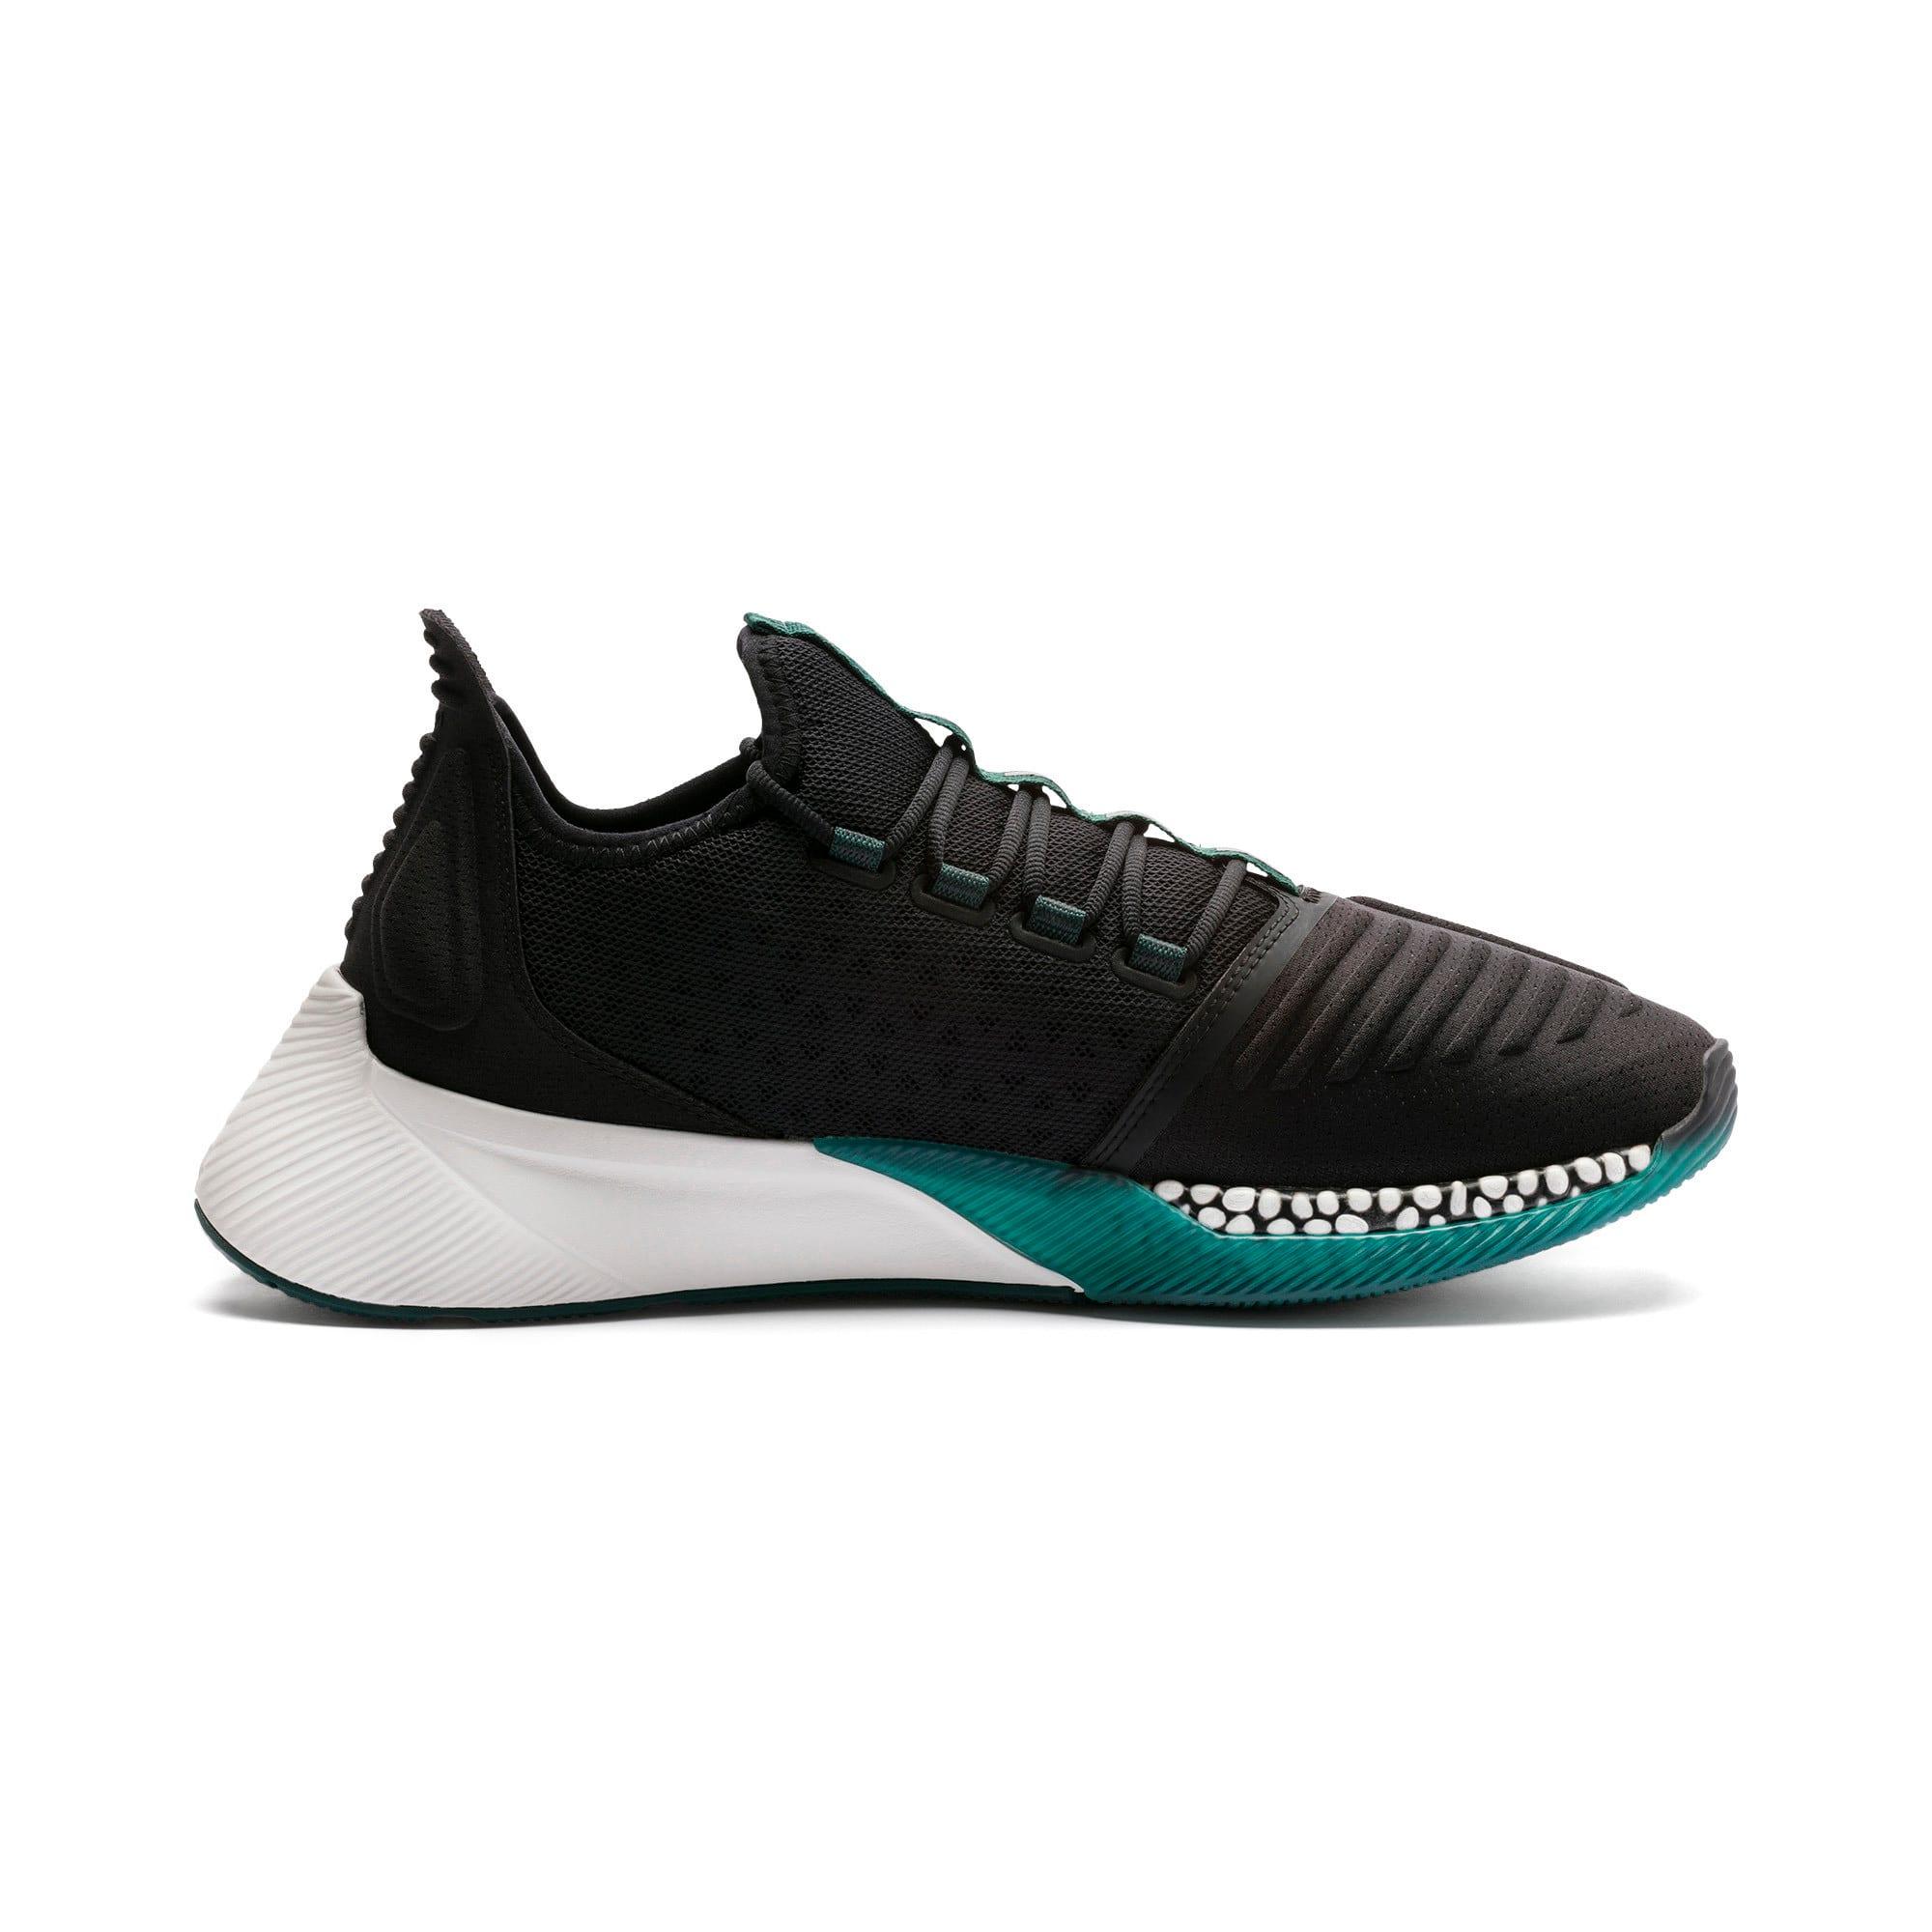 Thumbnail 6 of Xcelerator Men's Sneakers, Black-Glacier Gray-Ponderosa, medium